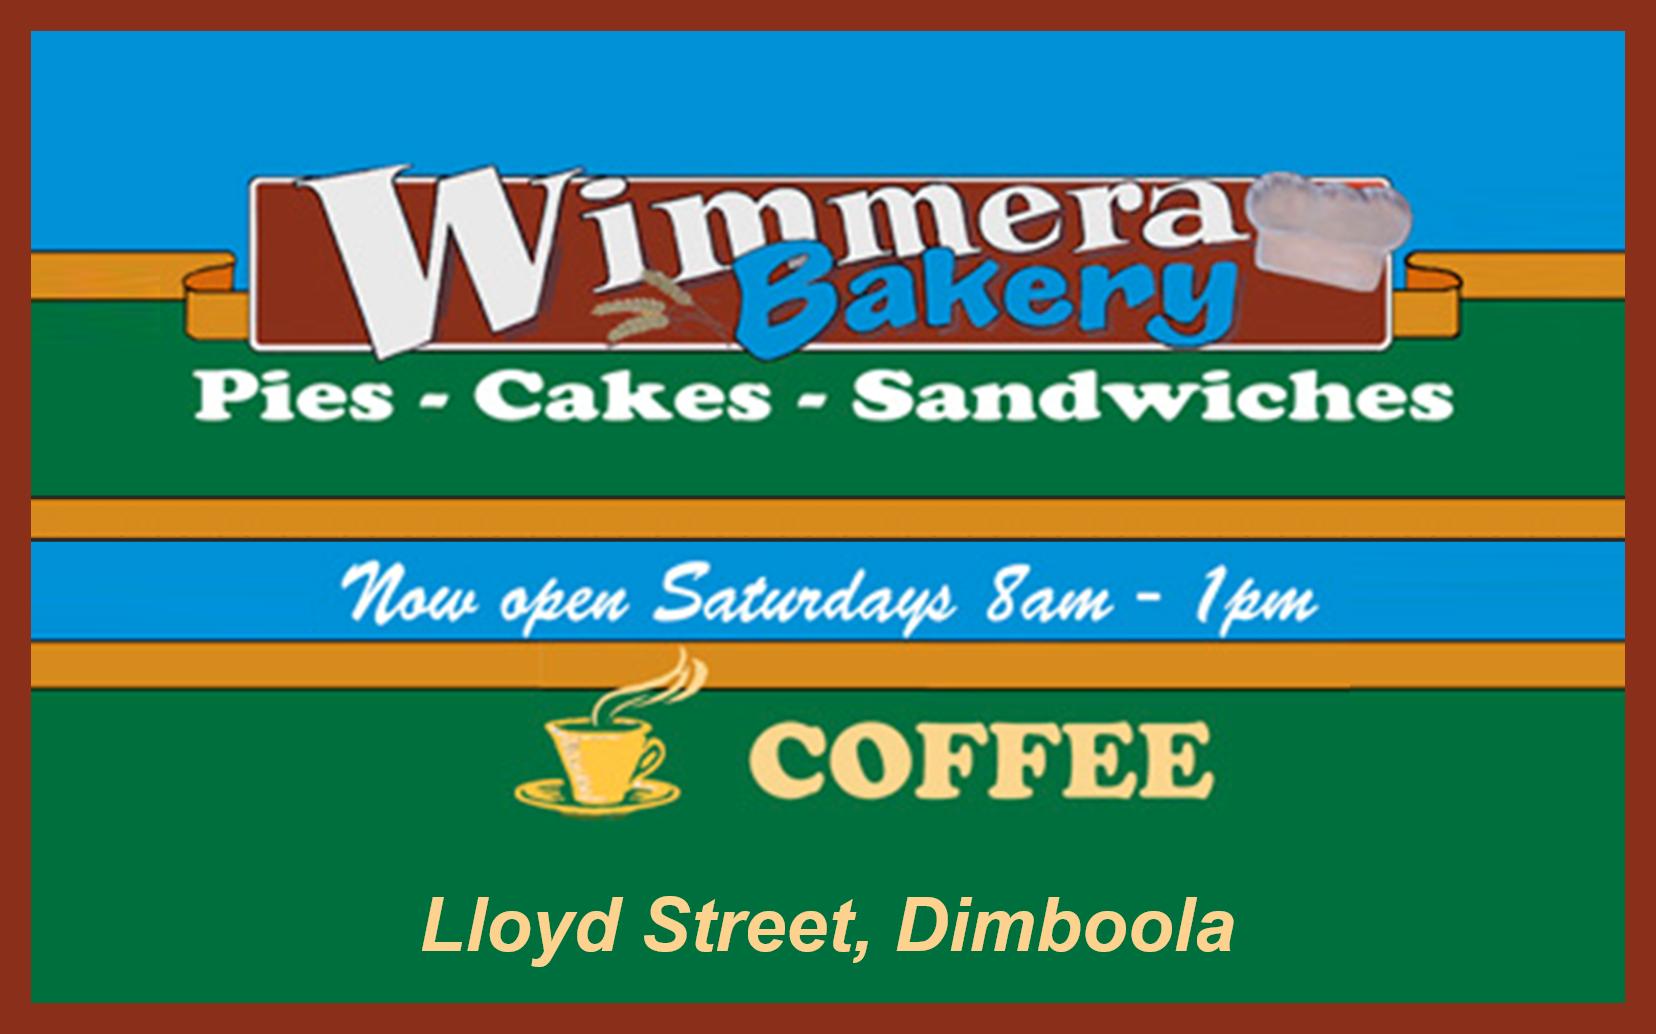 Wimmera Bakery